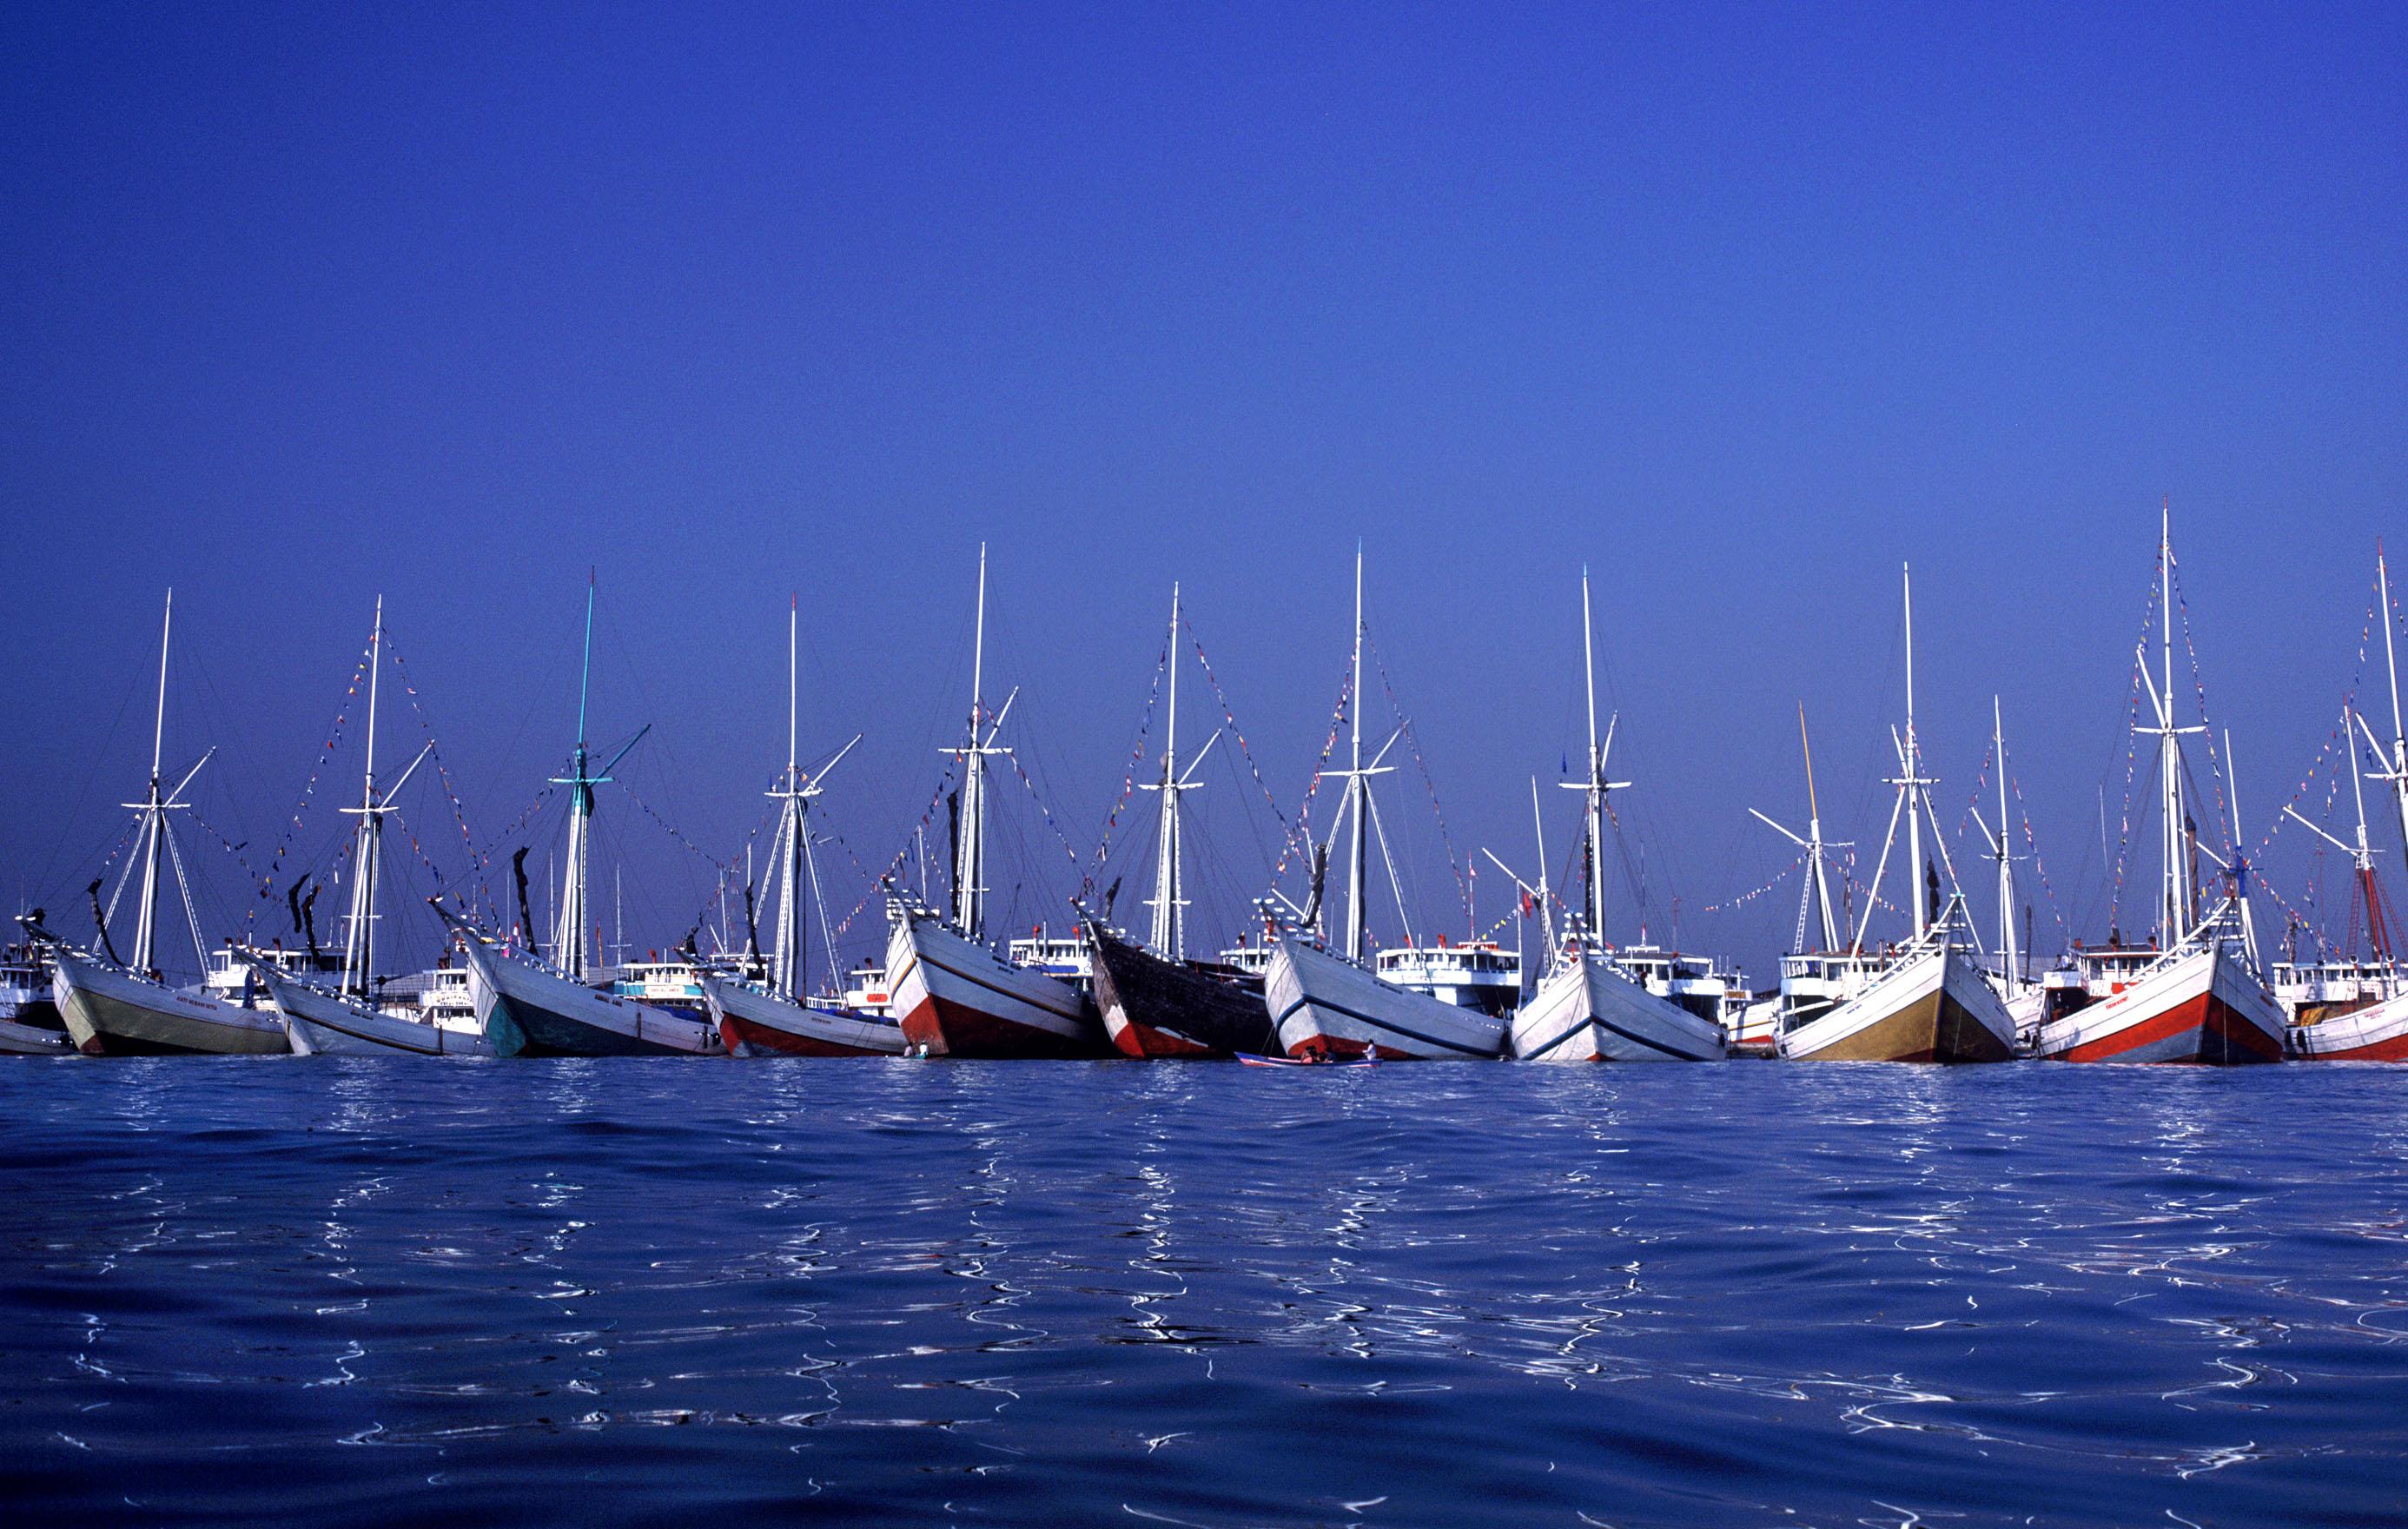 LM-015 Line-up of wooden Phinisi boats at Sunda Kelapa Port 1- North Jakarta